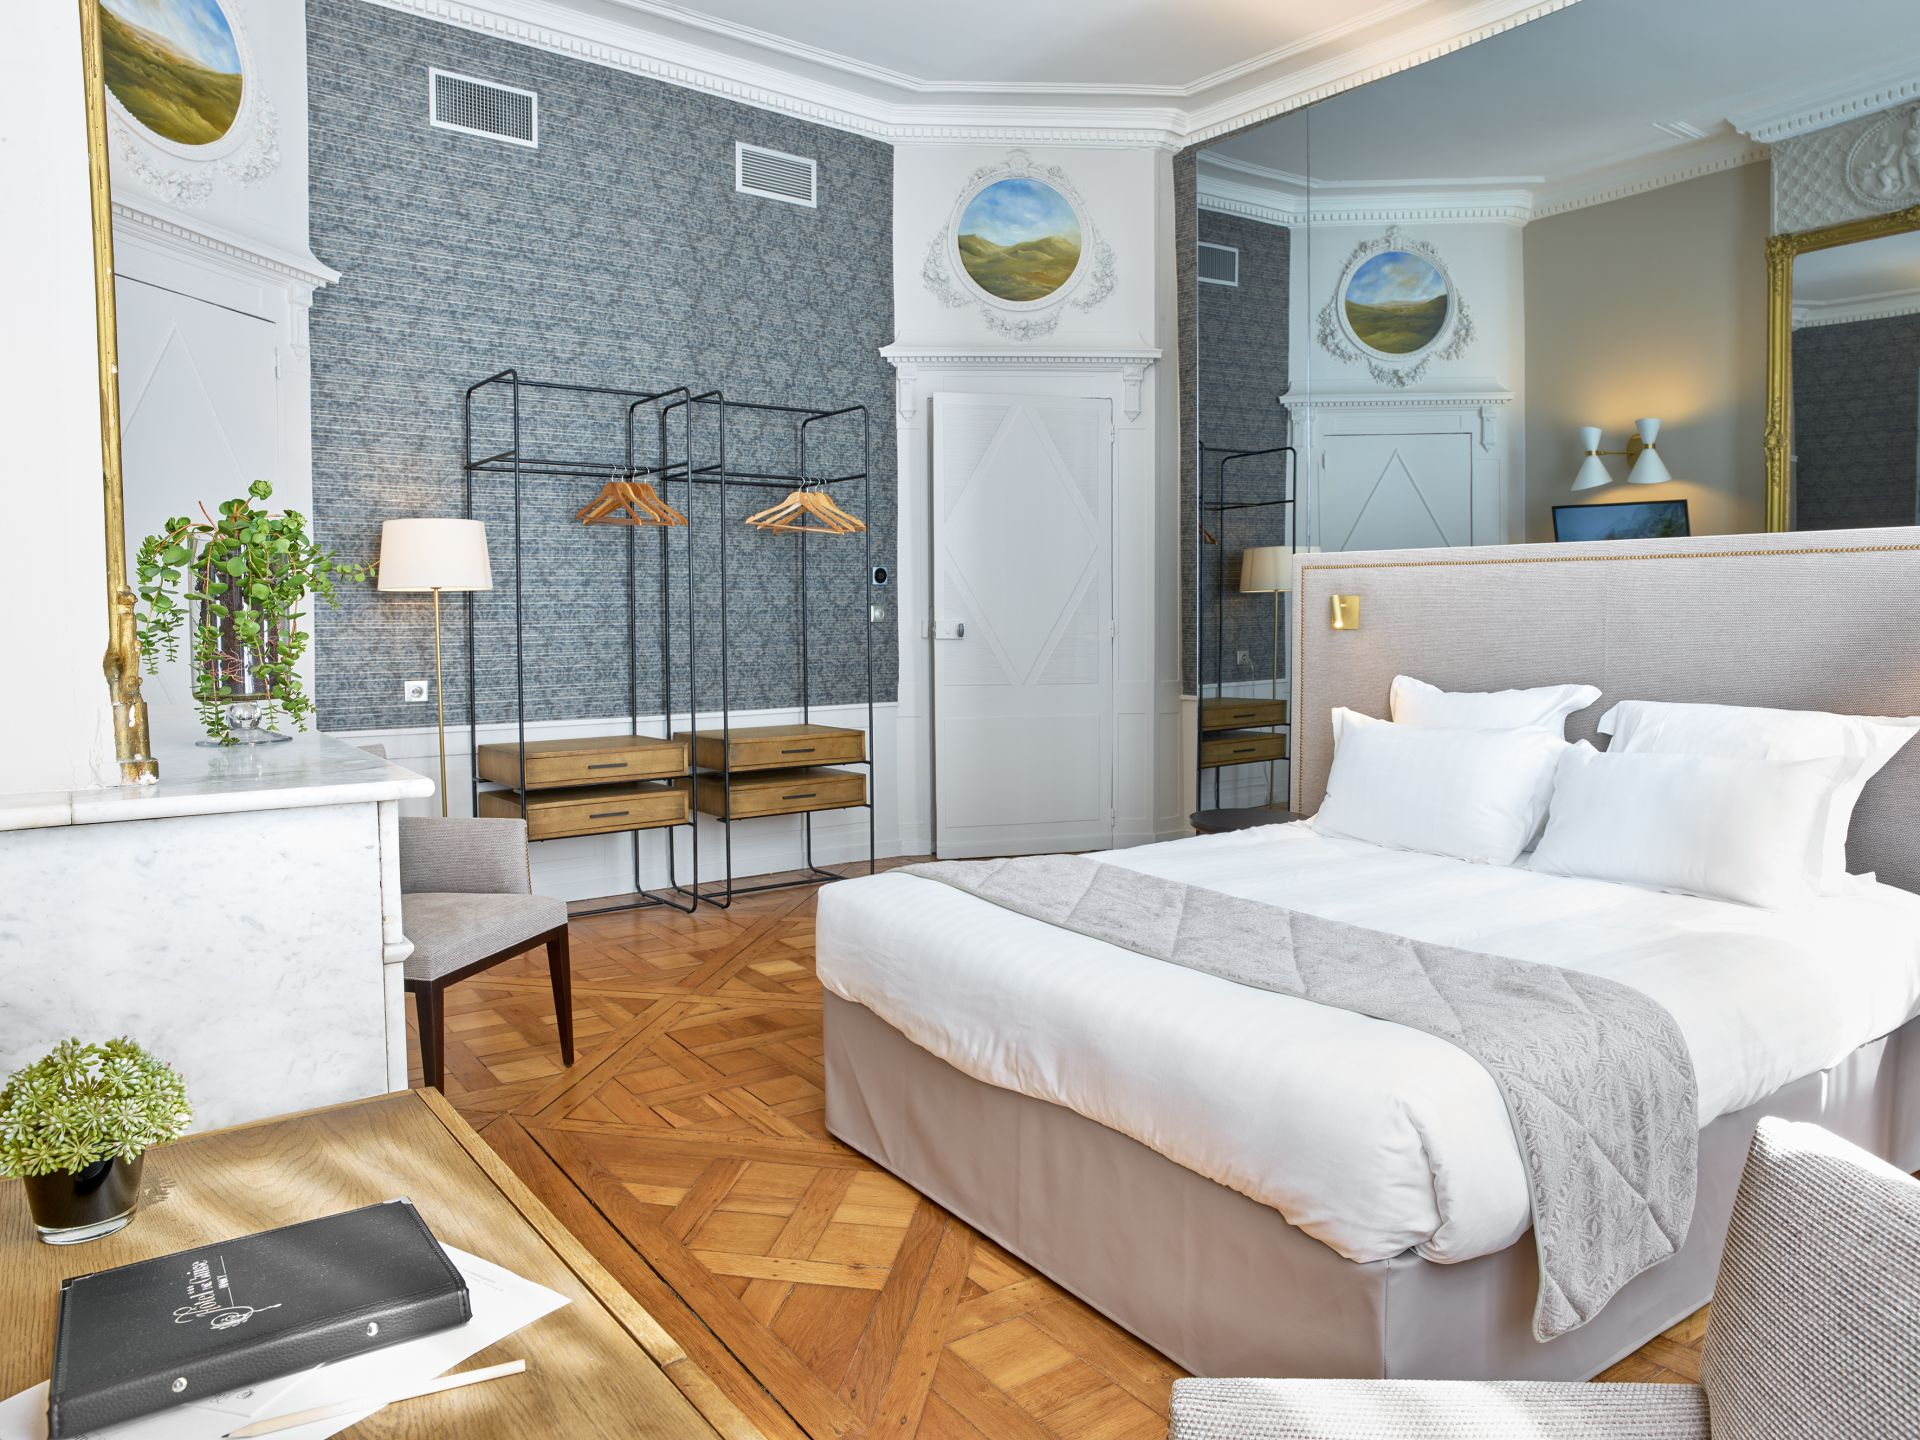 hotel de guise lorraine tourisme. Black Bedroom Furniture Sets. Home Design Ideas